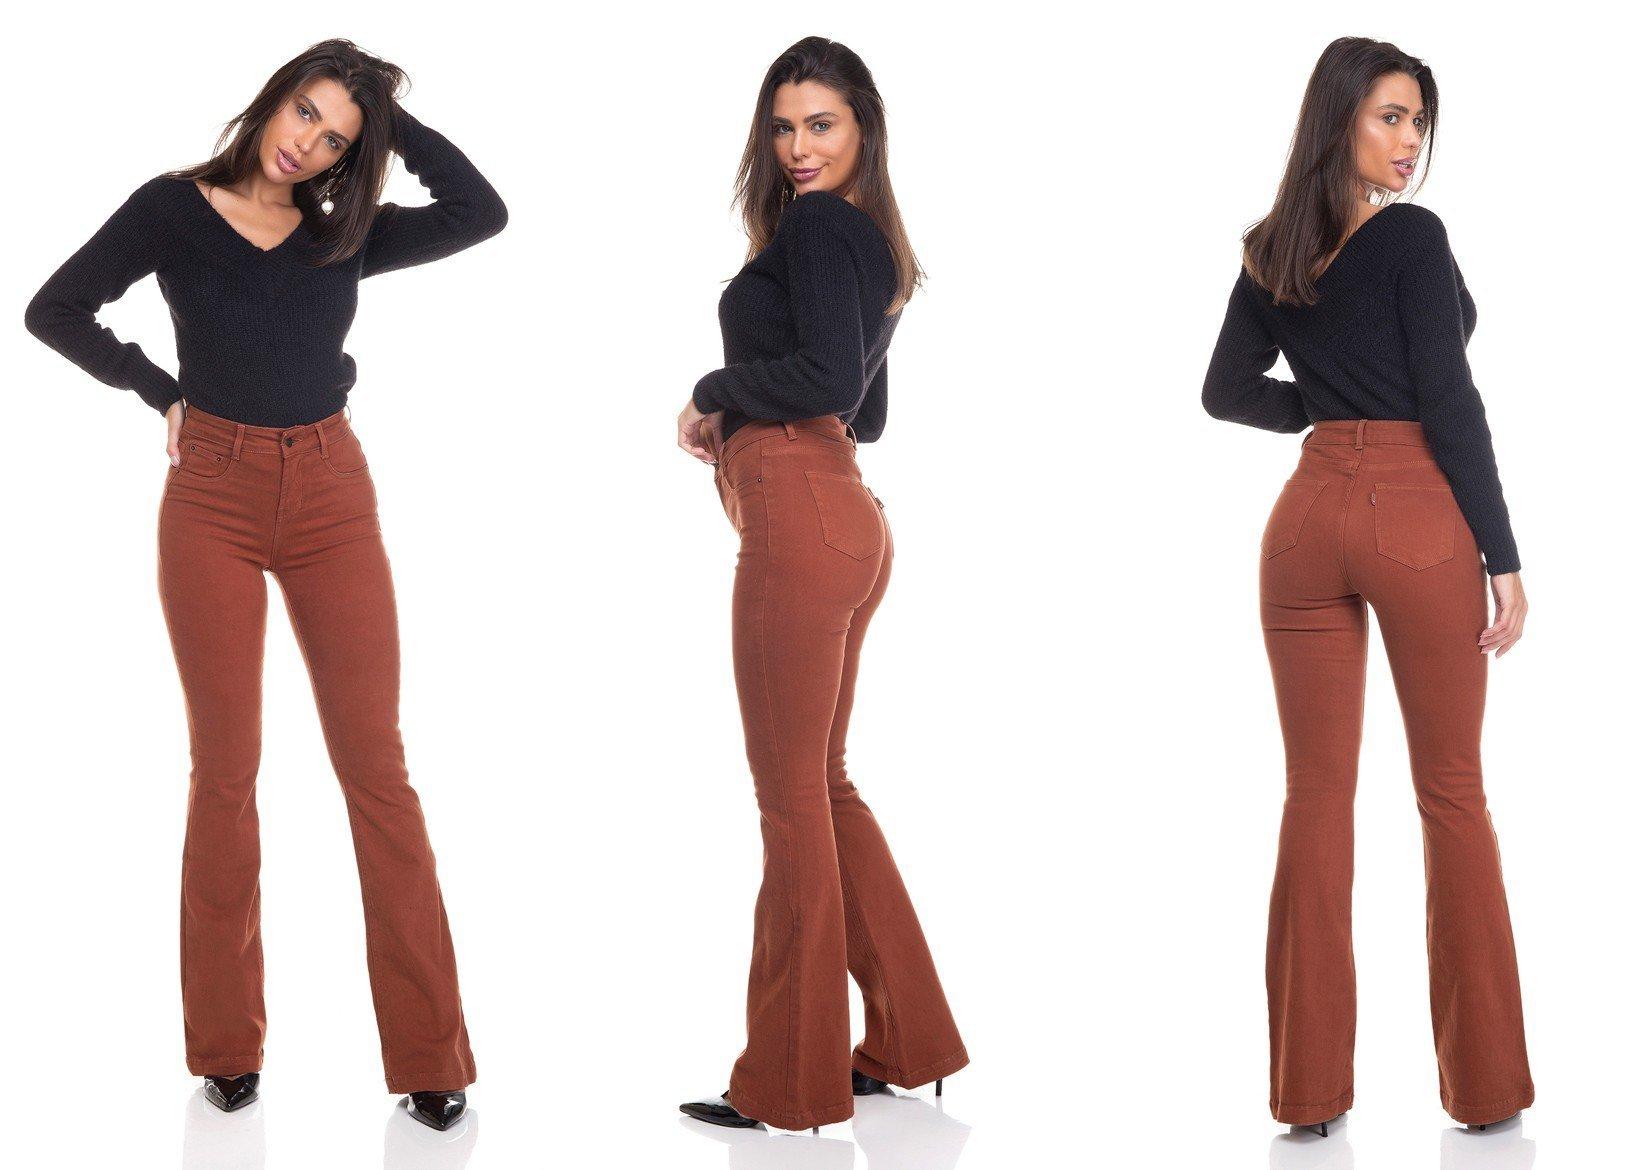 dz3453 calca jeans feminina flare media colorida raposa tripla